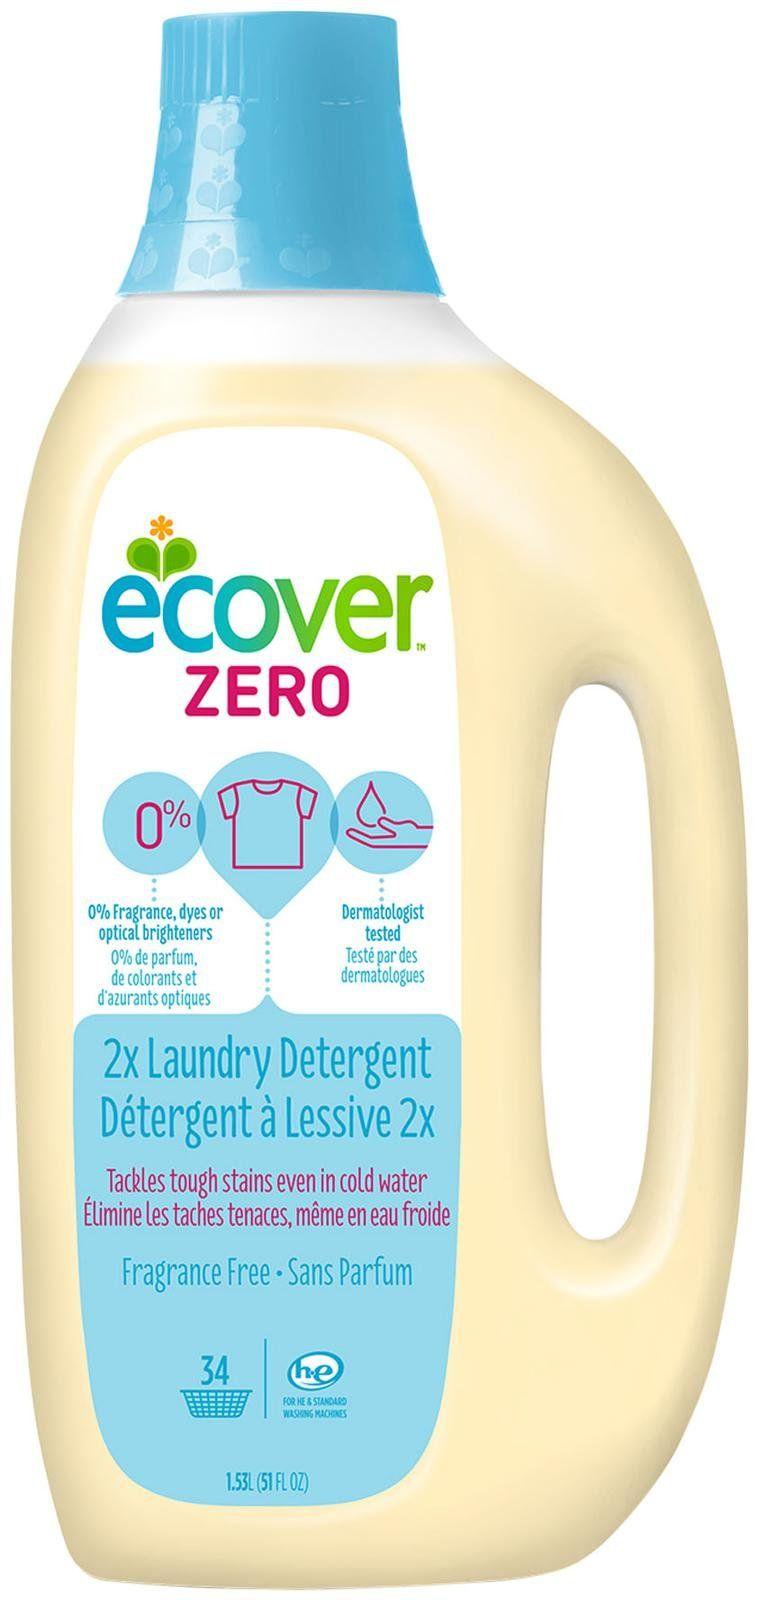 Ecover Laundry Detergent Zero Free Shipping Laundry Liquid